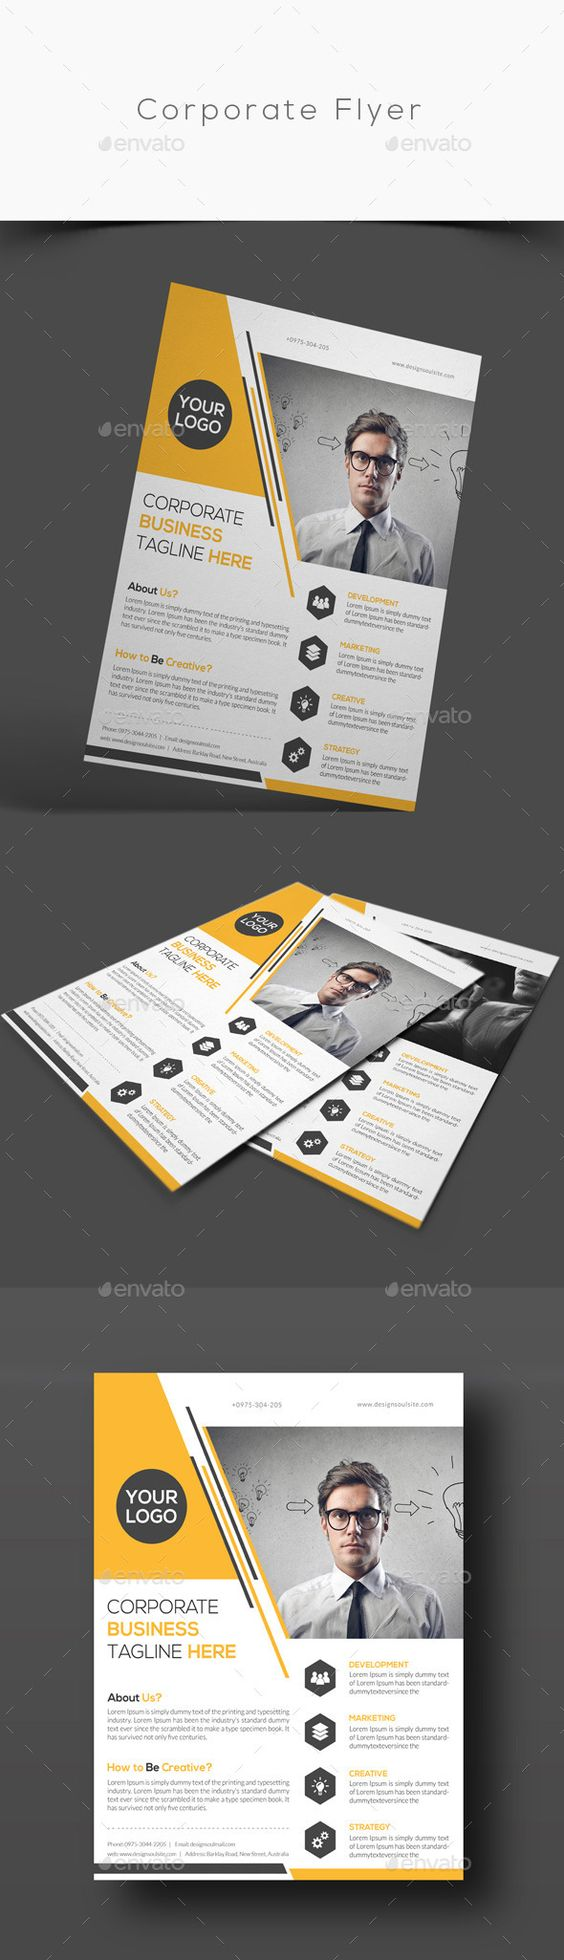 Corporate Flyer Template #design Download: http://graphicriver.net/item/corporate-flyer/12605010?ref=ksioks